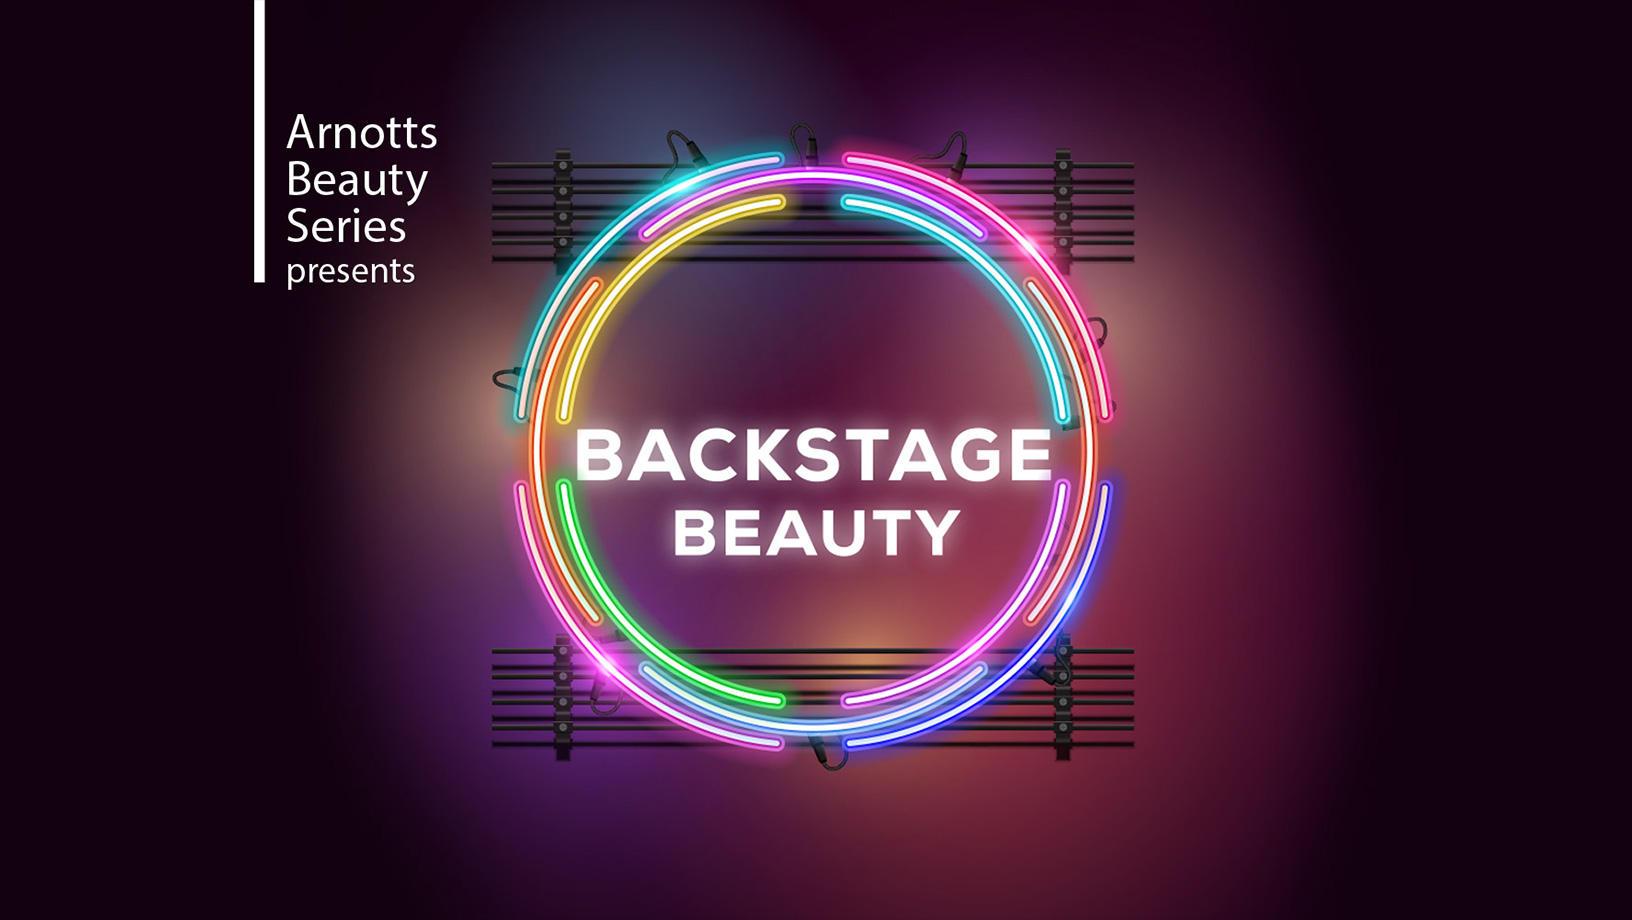 Backstage Beauty